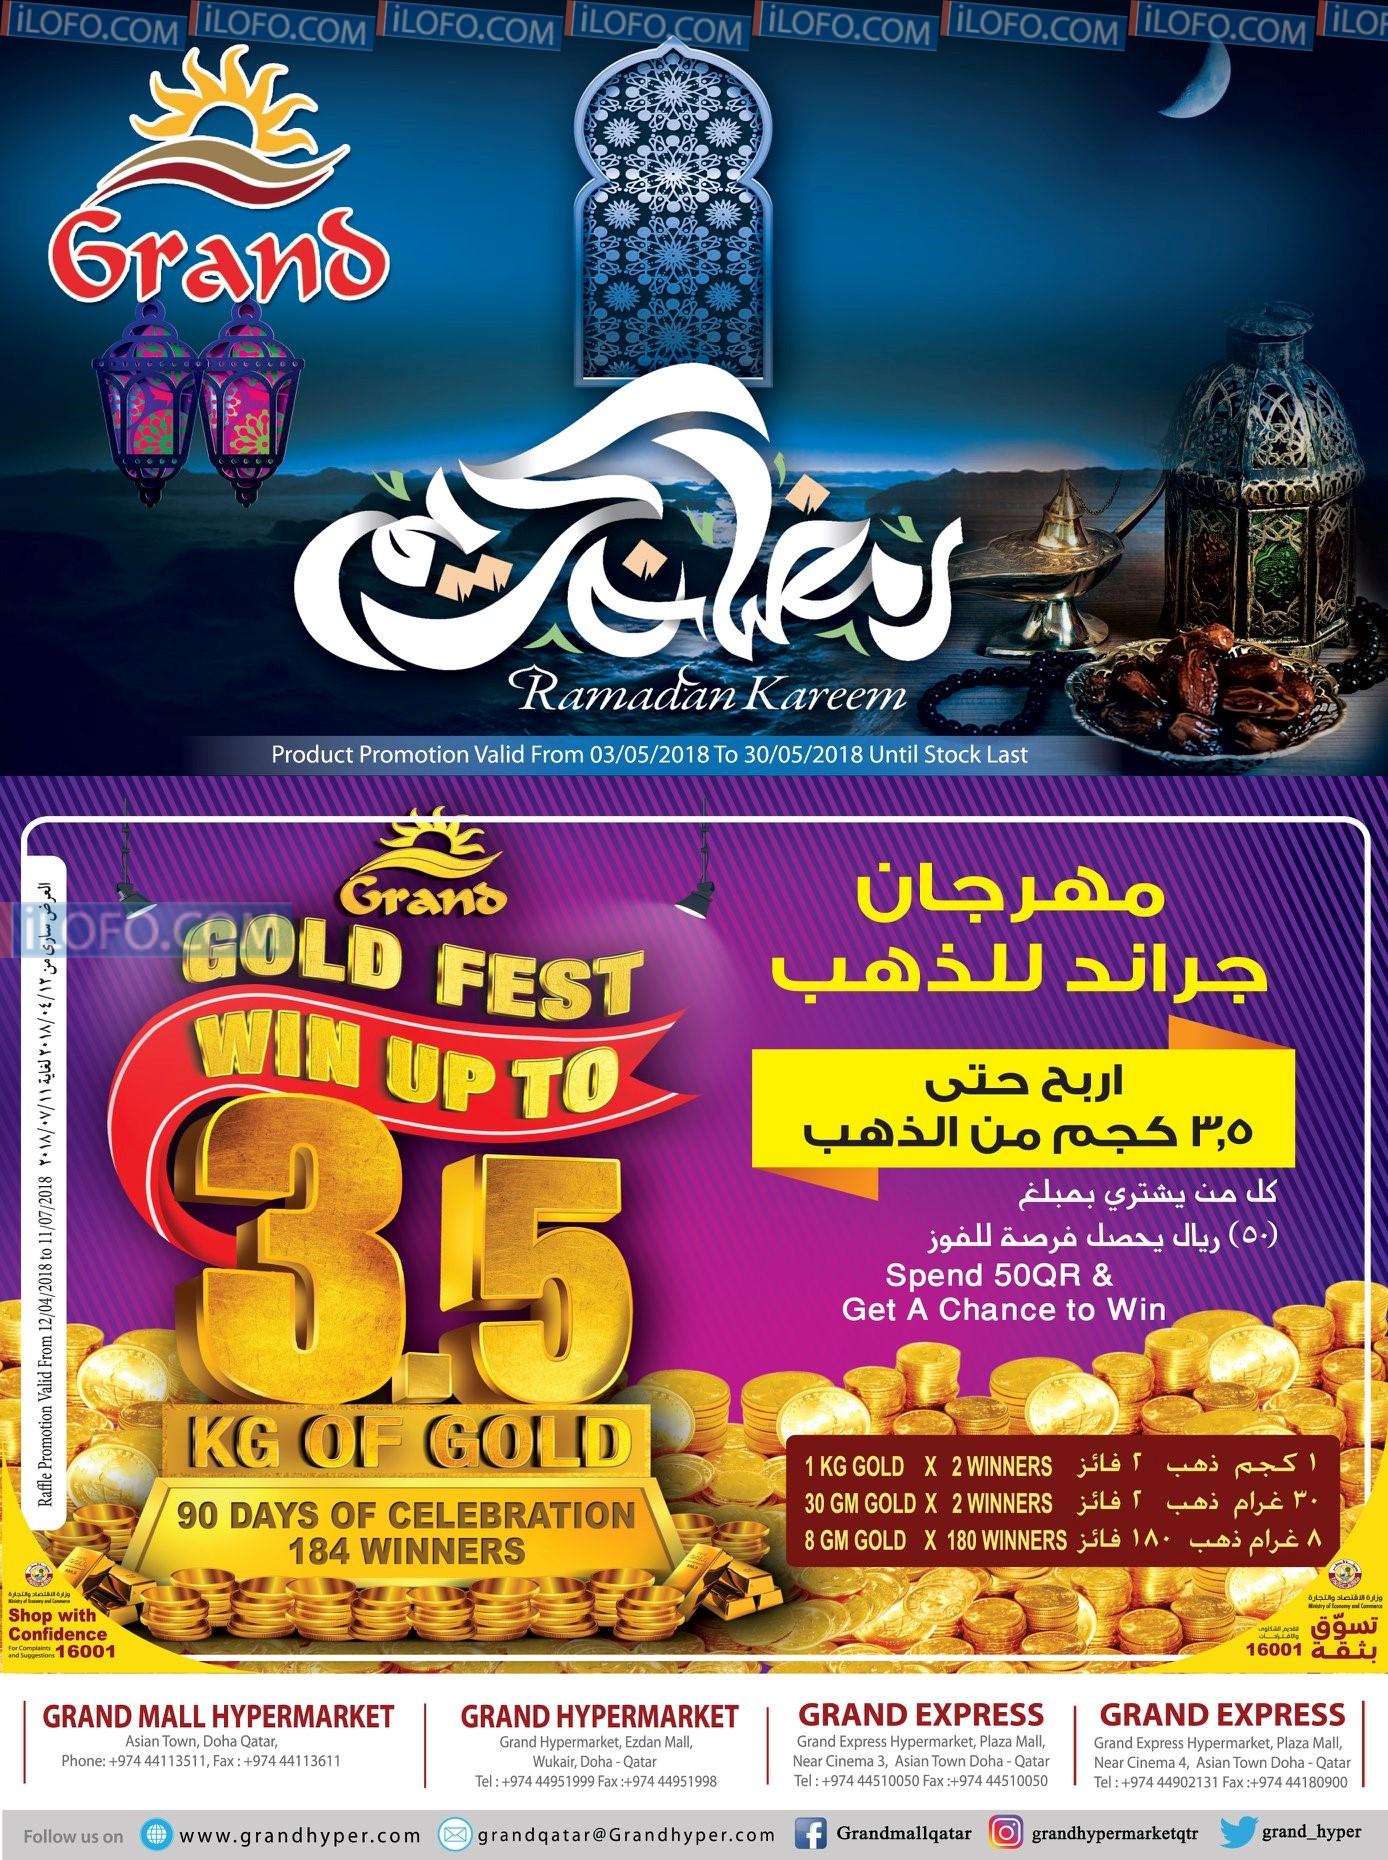 Grand Hypermarket Ramadan Kareem Offers